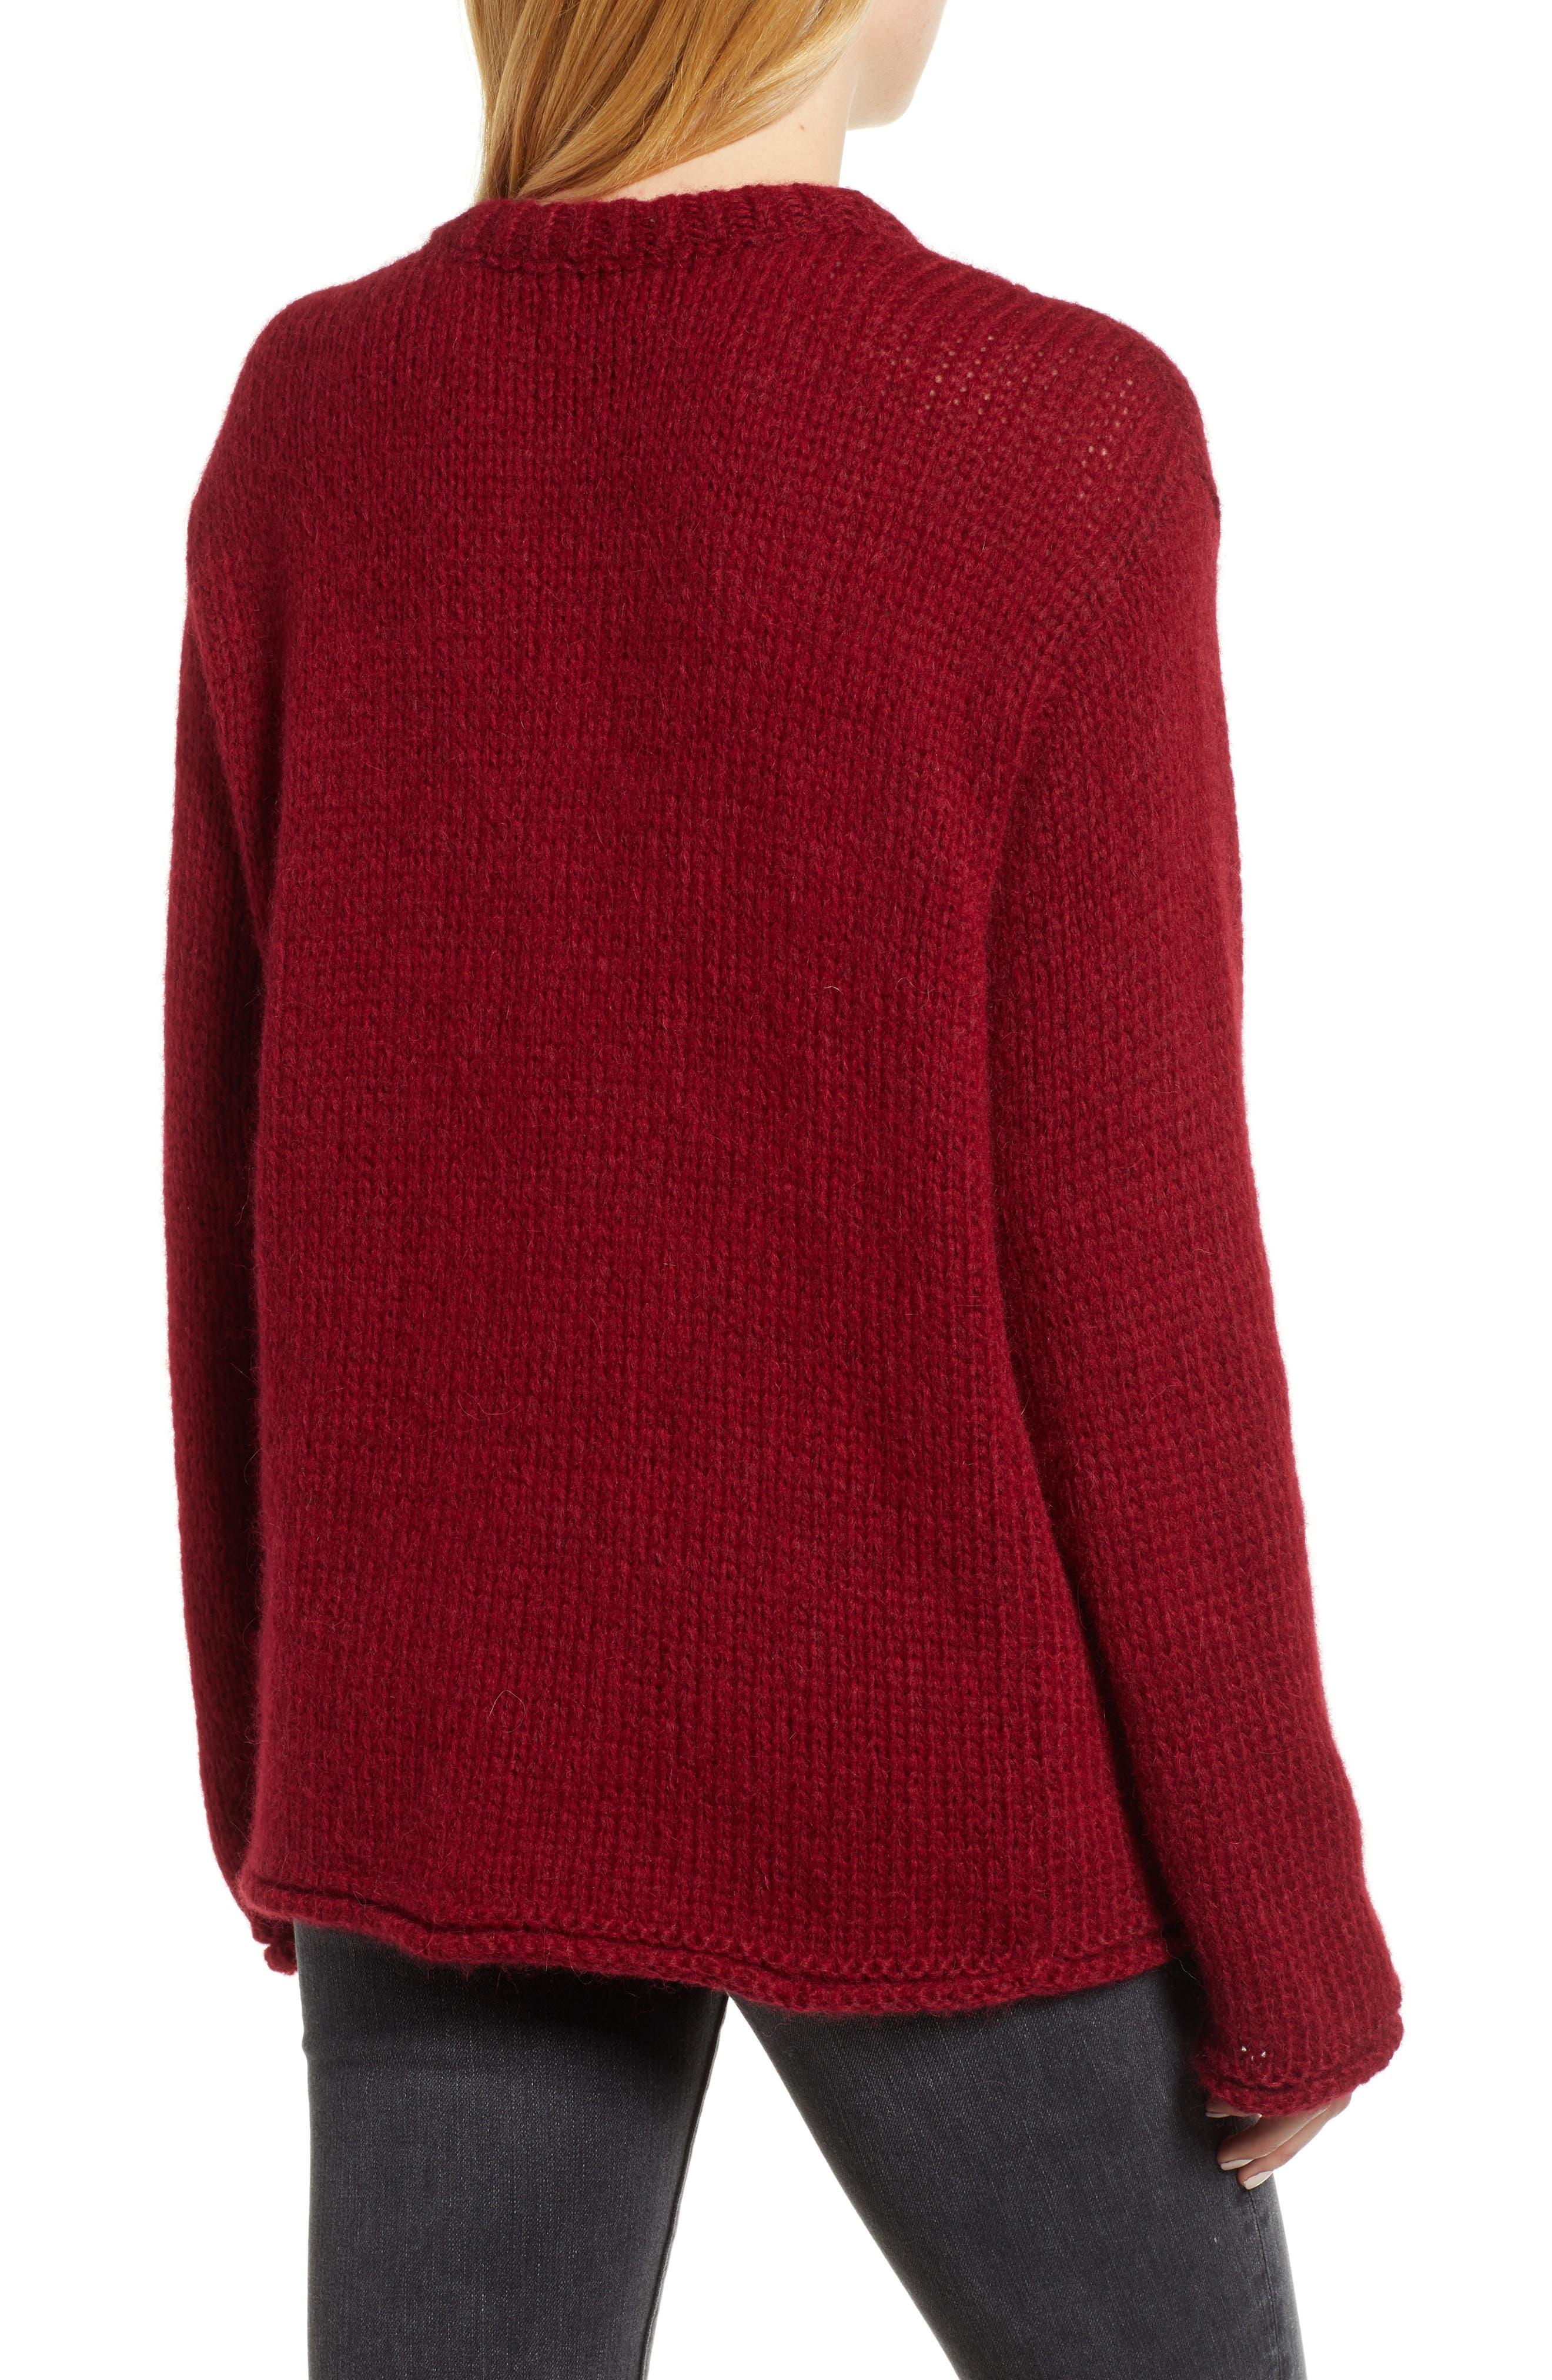 Wool Alpaca Blend Crewneck Sweater,                             Alternate thumbnail 2, color,                             WINE